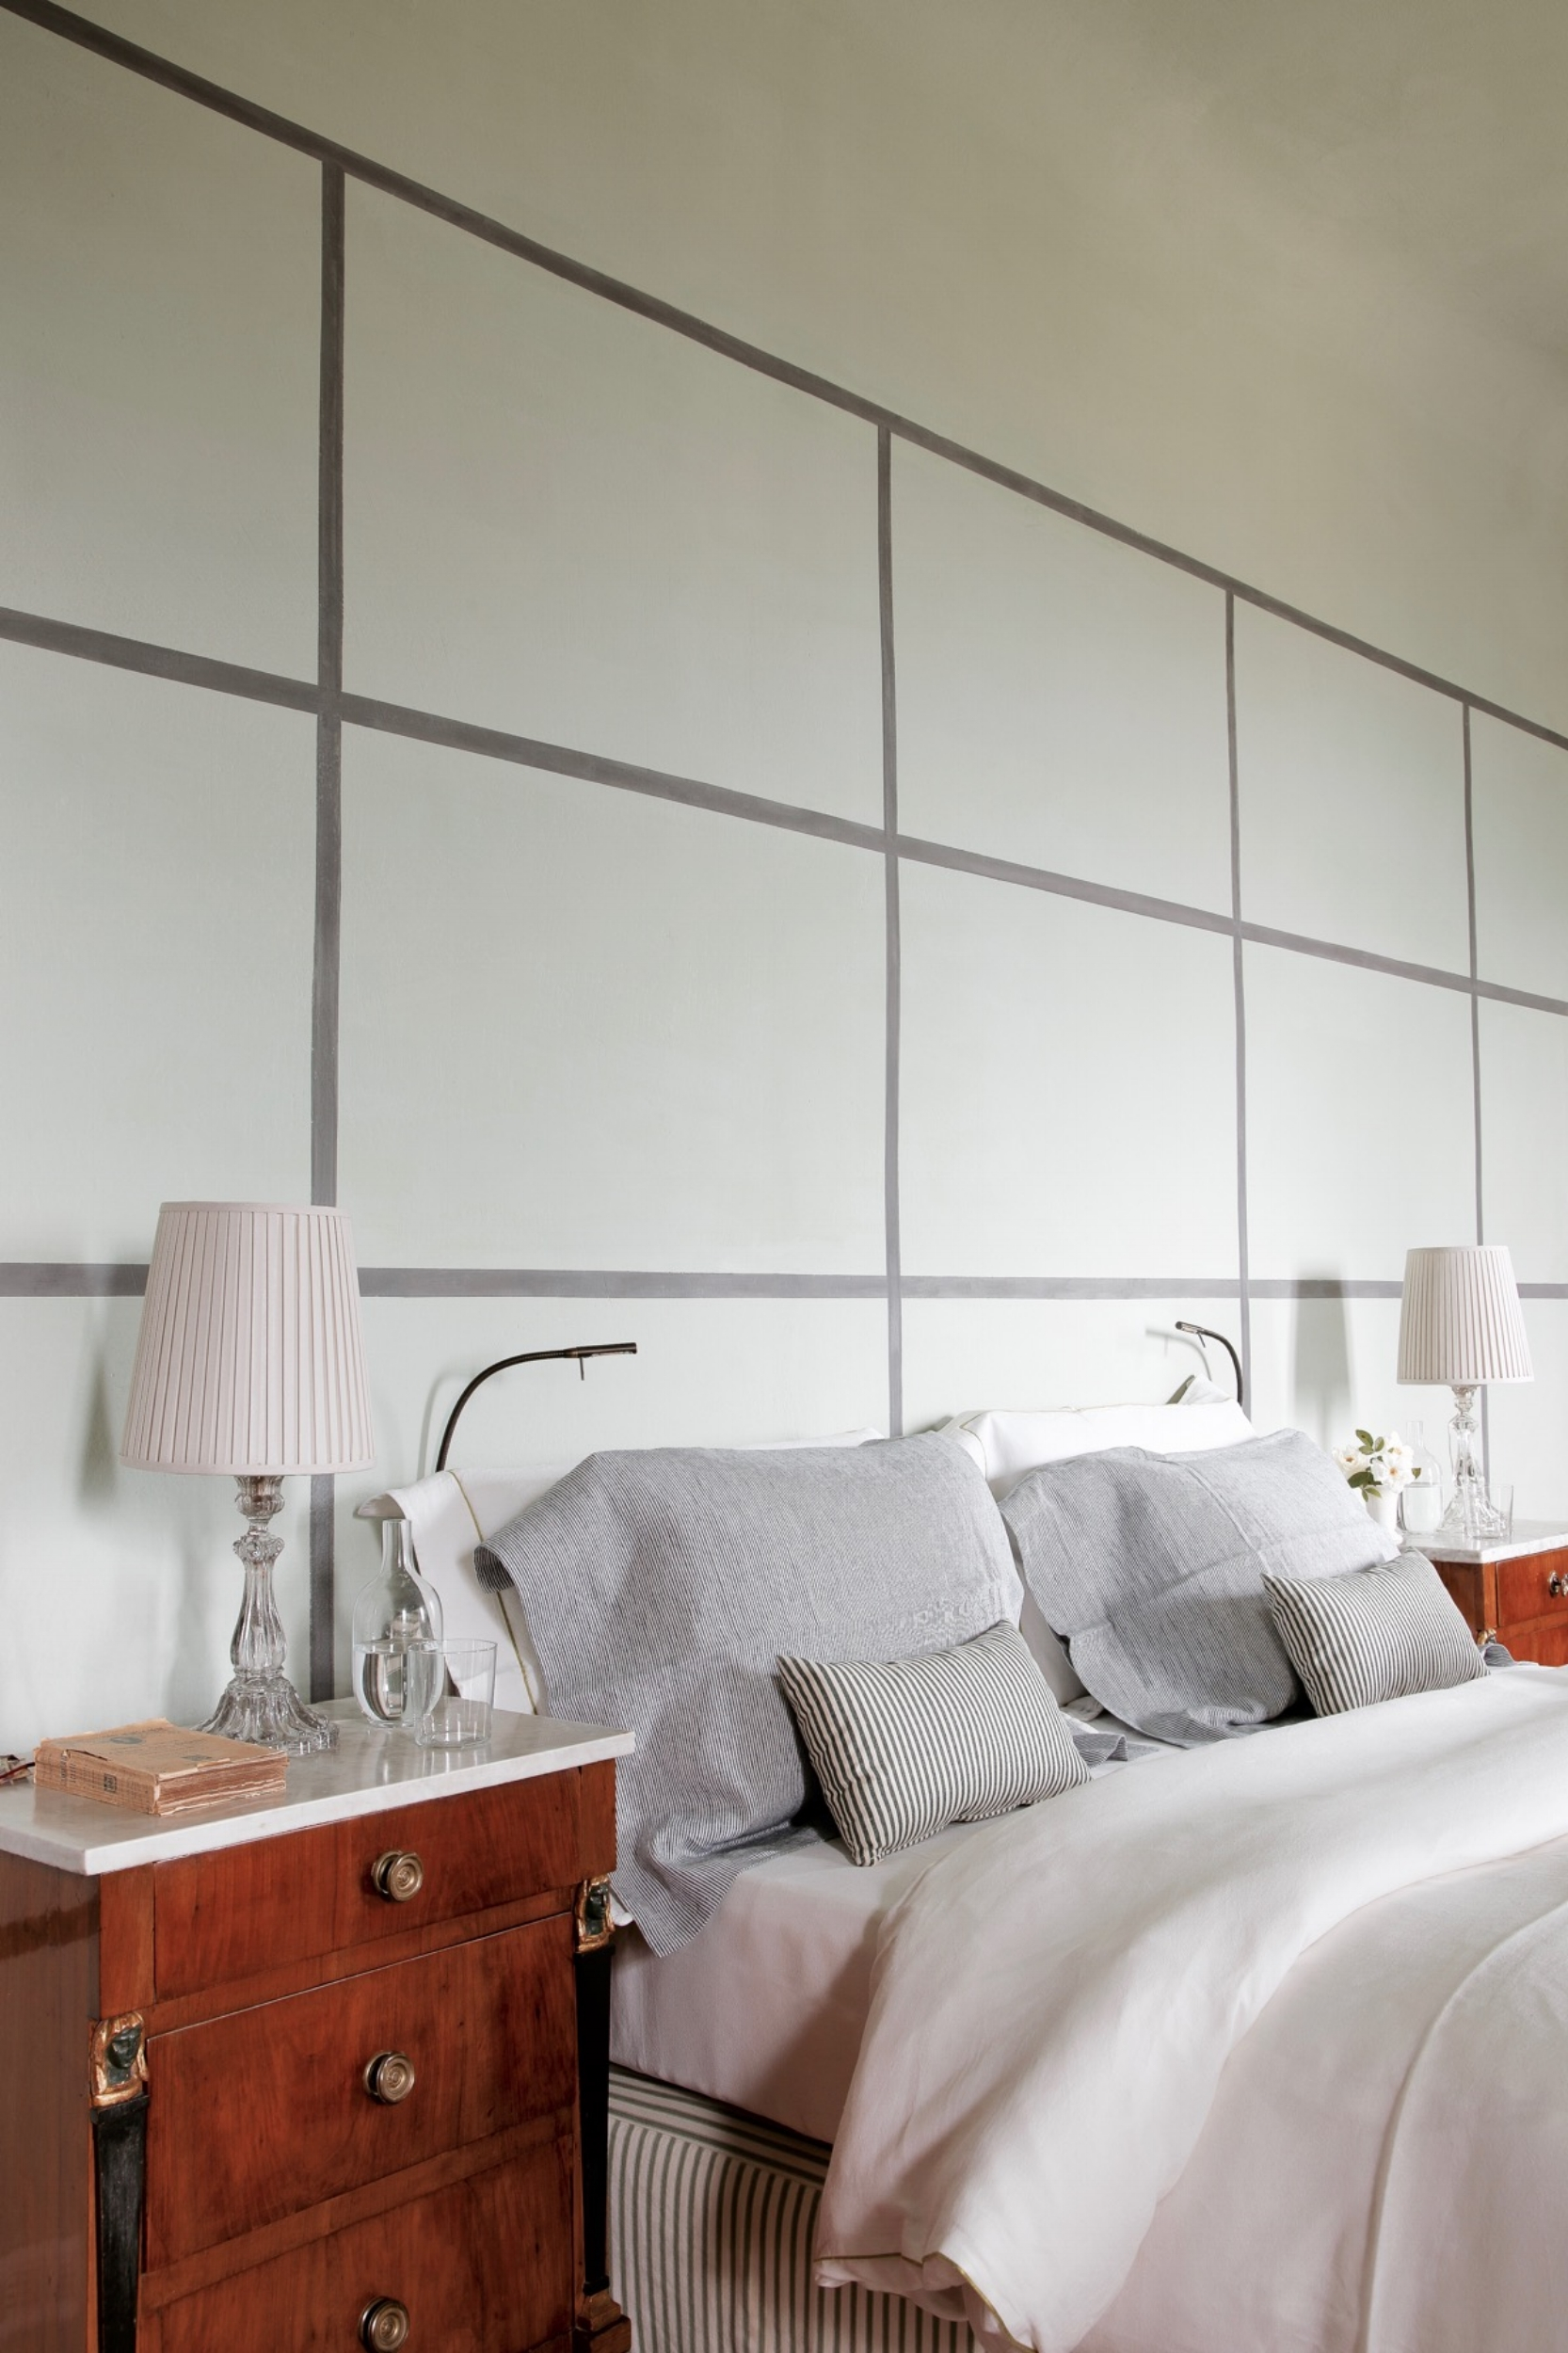 Bedroom_1115047.jpg